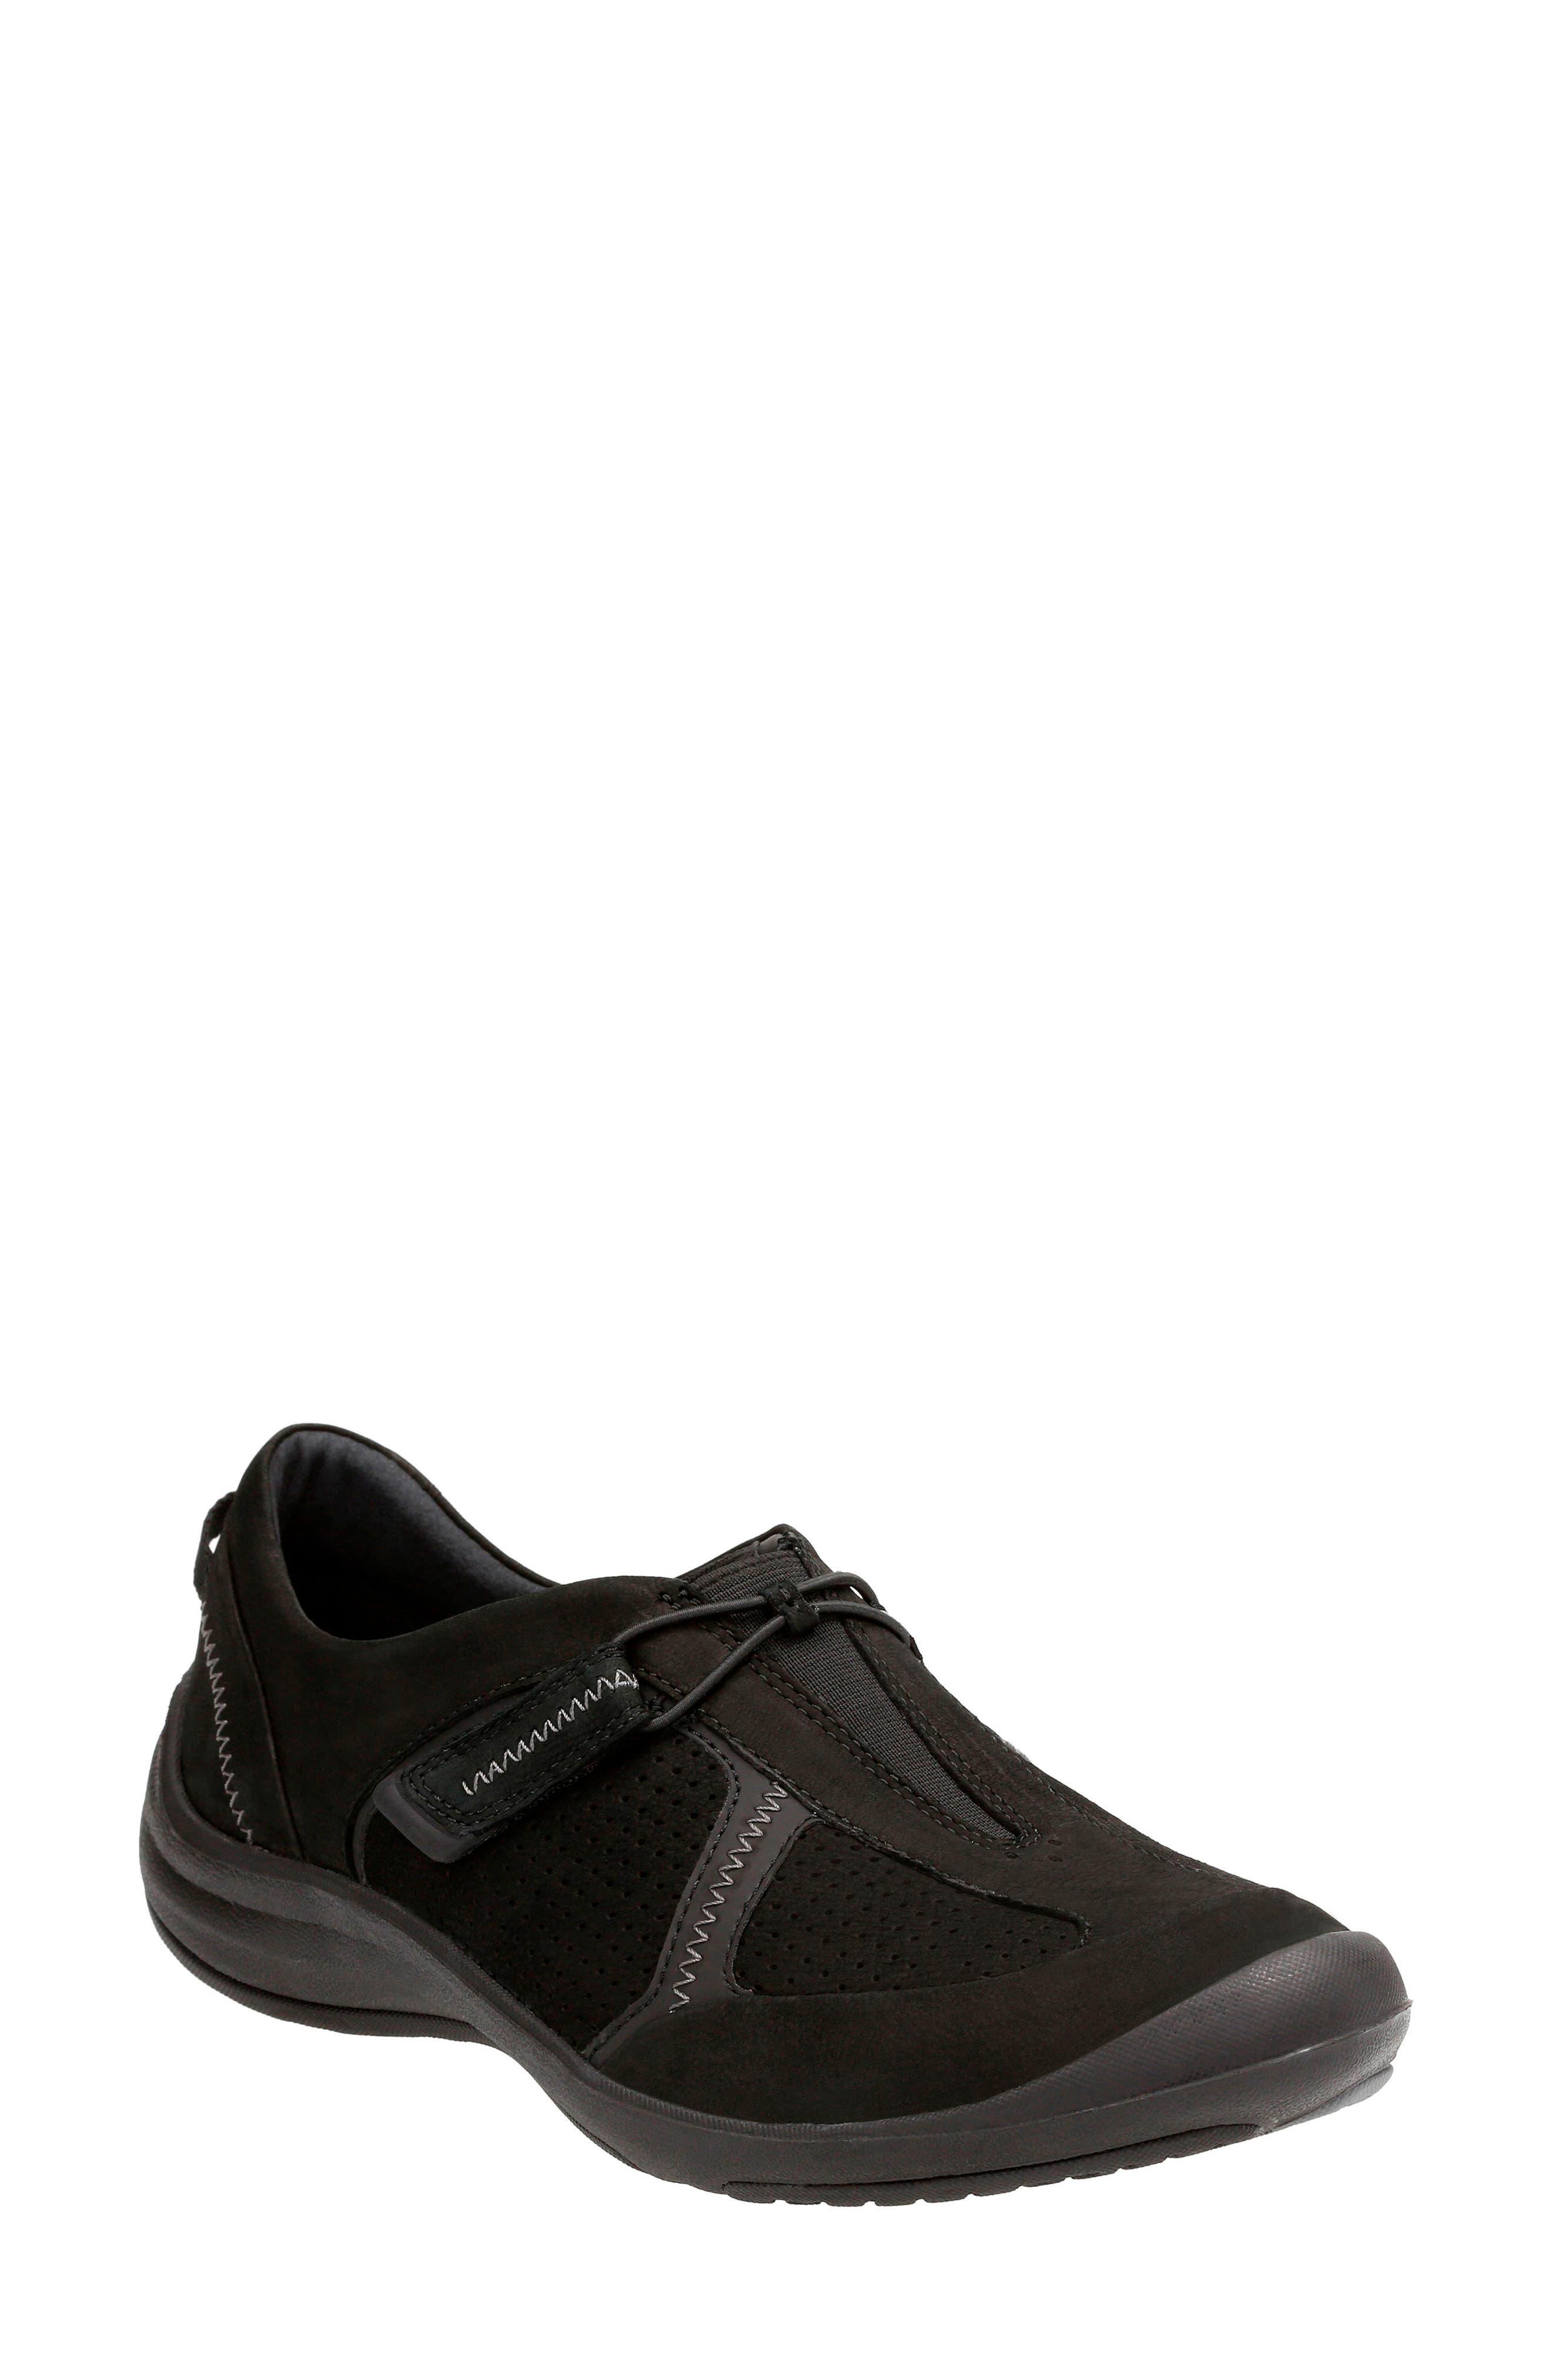 'Asney' Slip-On Sneaker,                         Main,                         color, 002